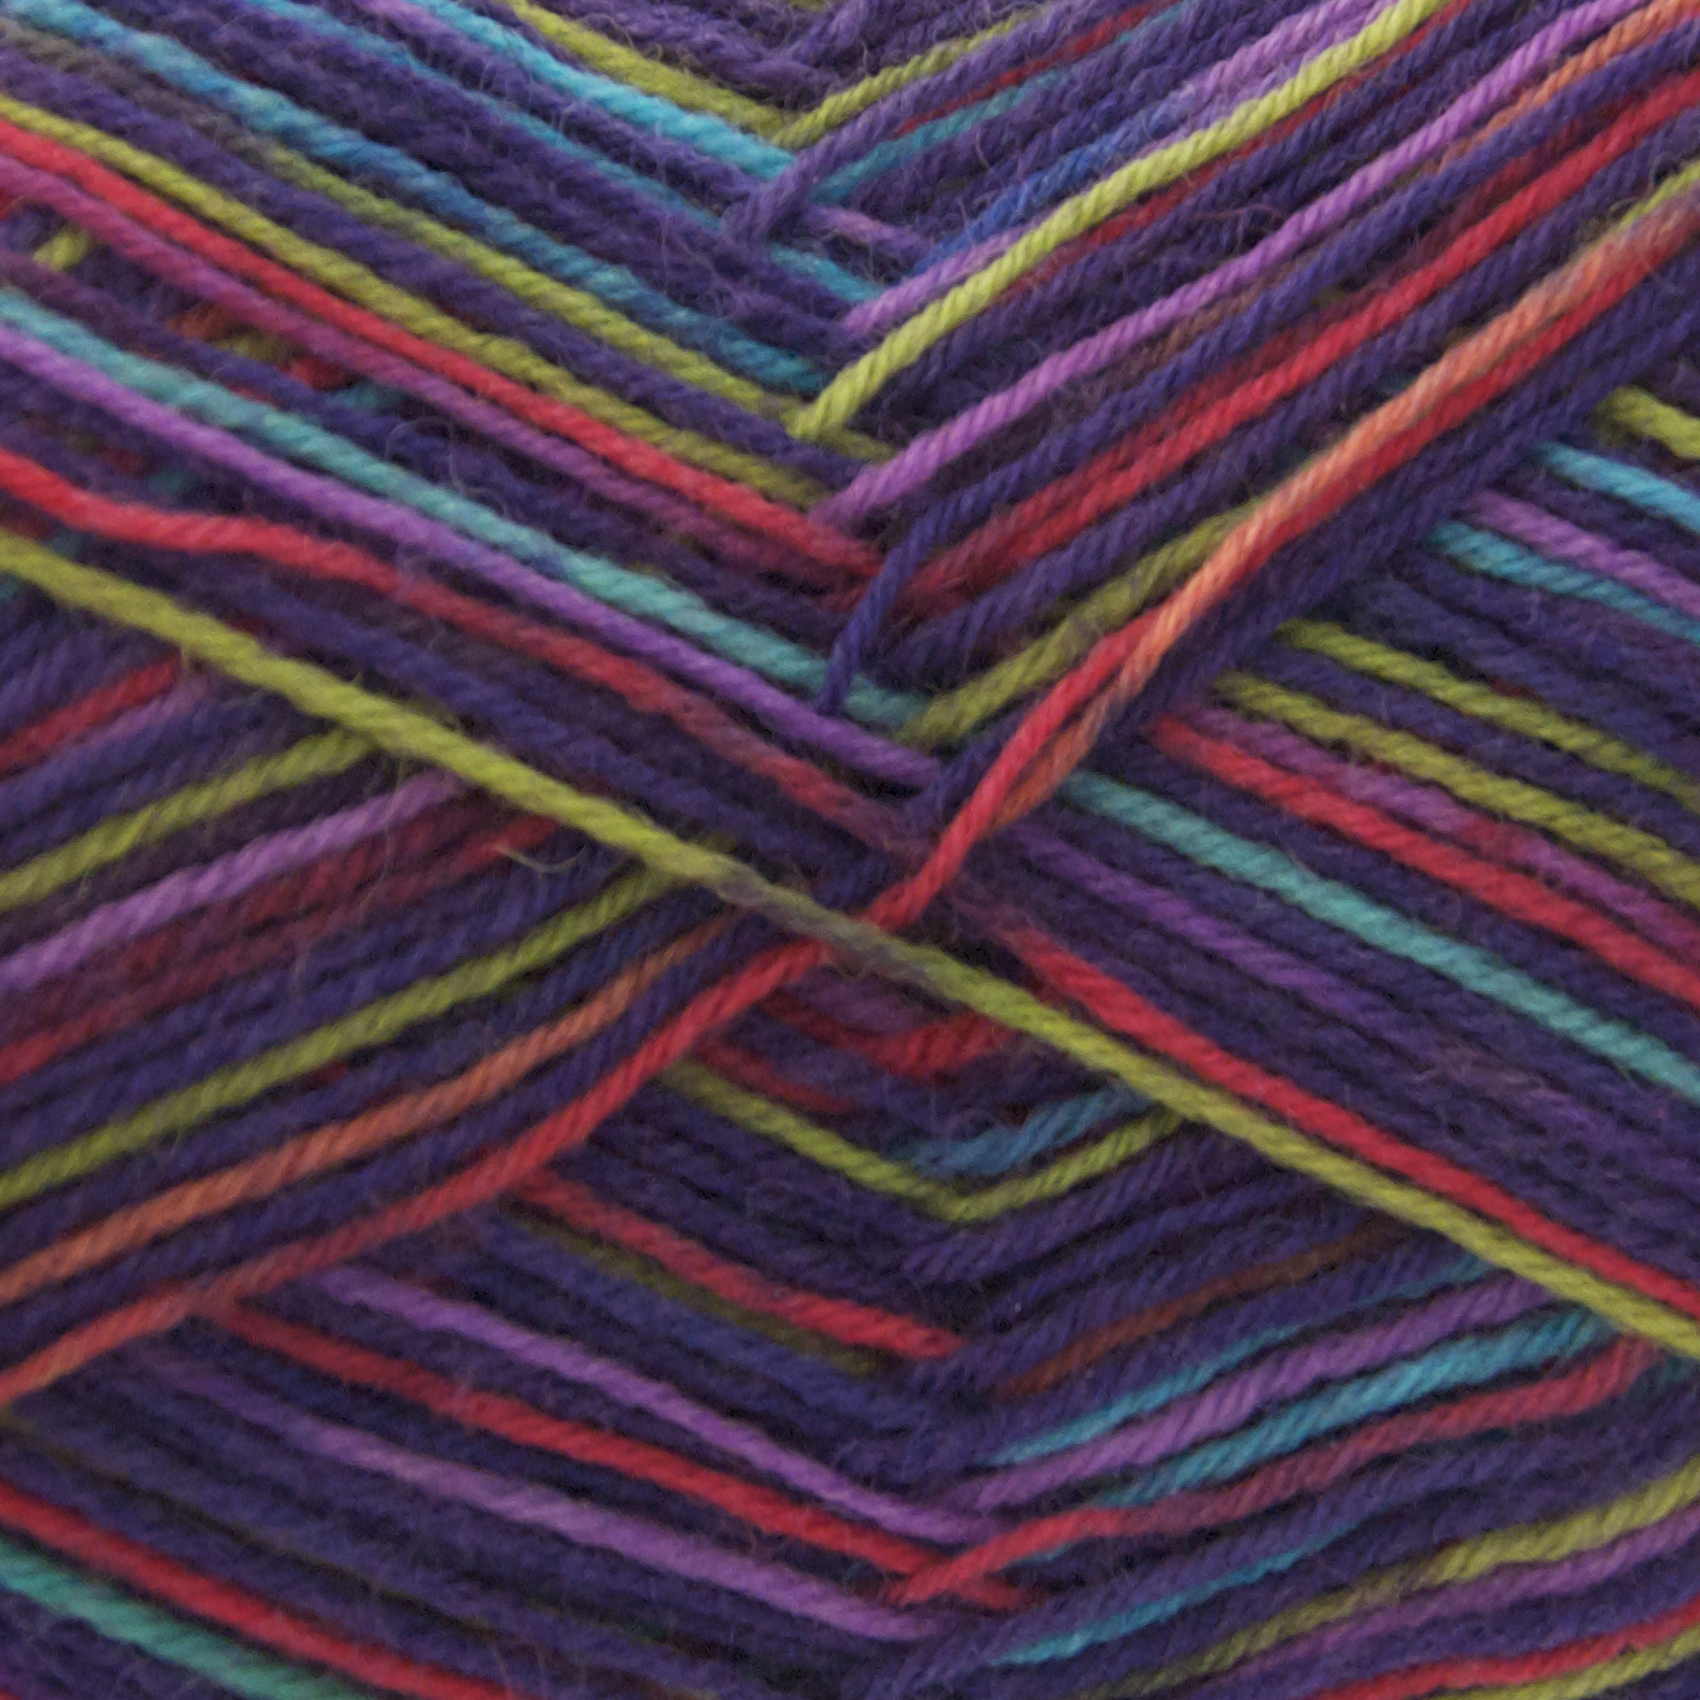 Knitting Patterns 4 Ply Wool : 100g Ball Zig Zag 4 Ply Sock Knitting Wool King Cole Superwash Soft Craft Yar...